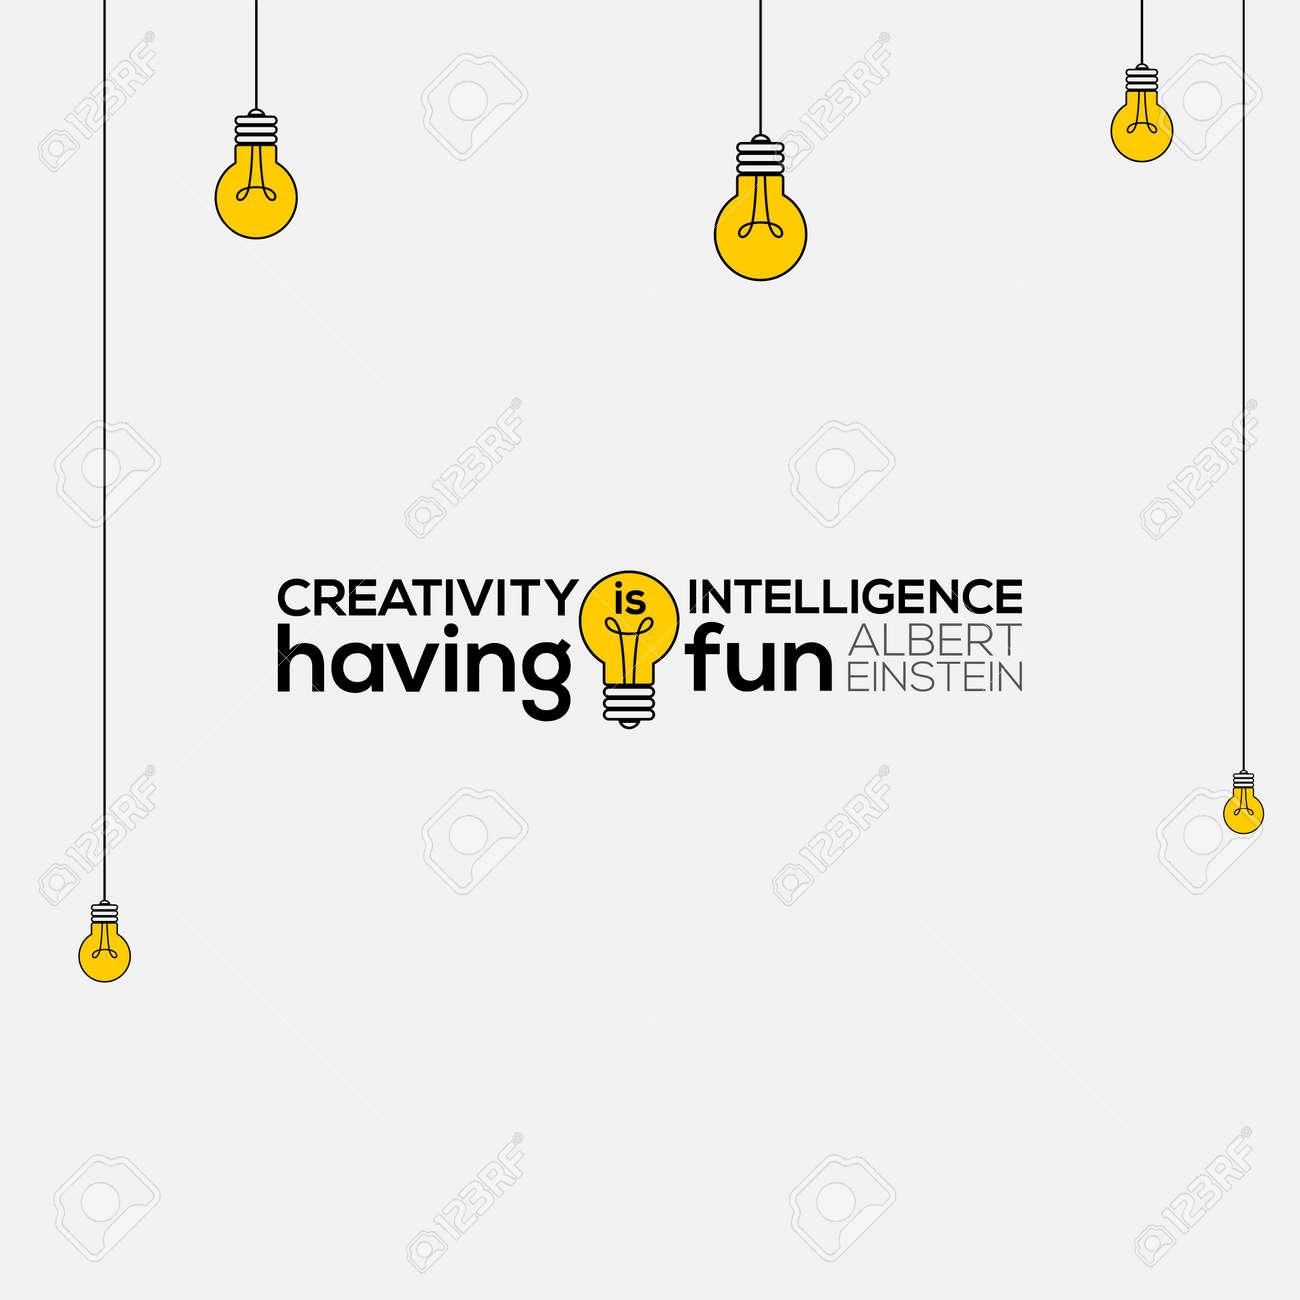 creativity is intelligence having fun wall art, Albert Einstein..